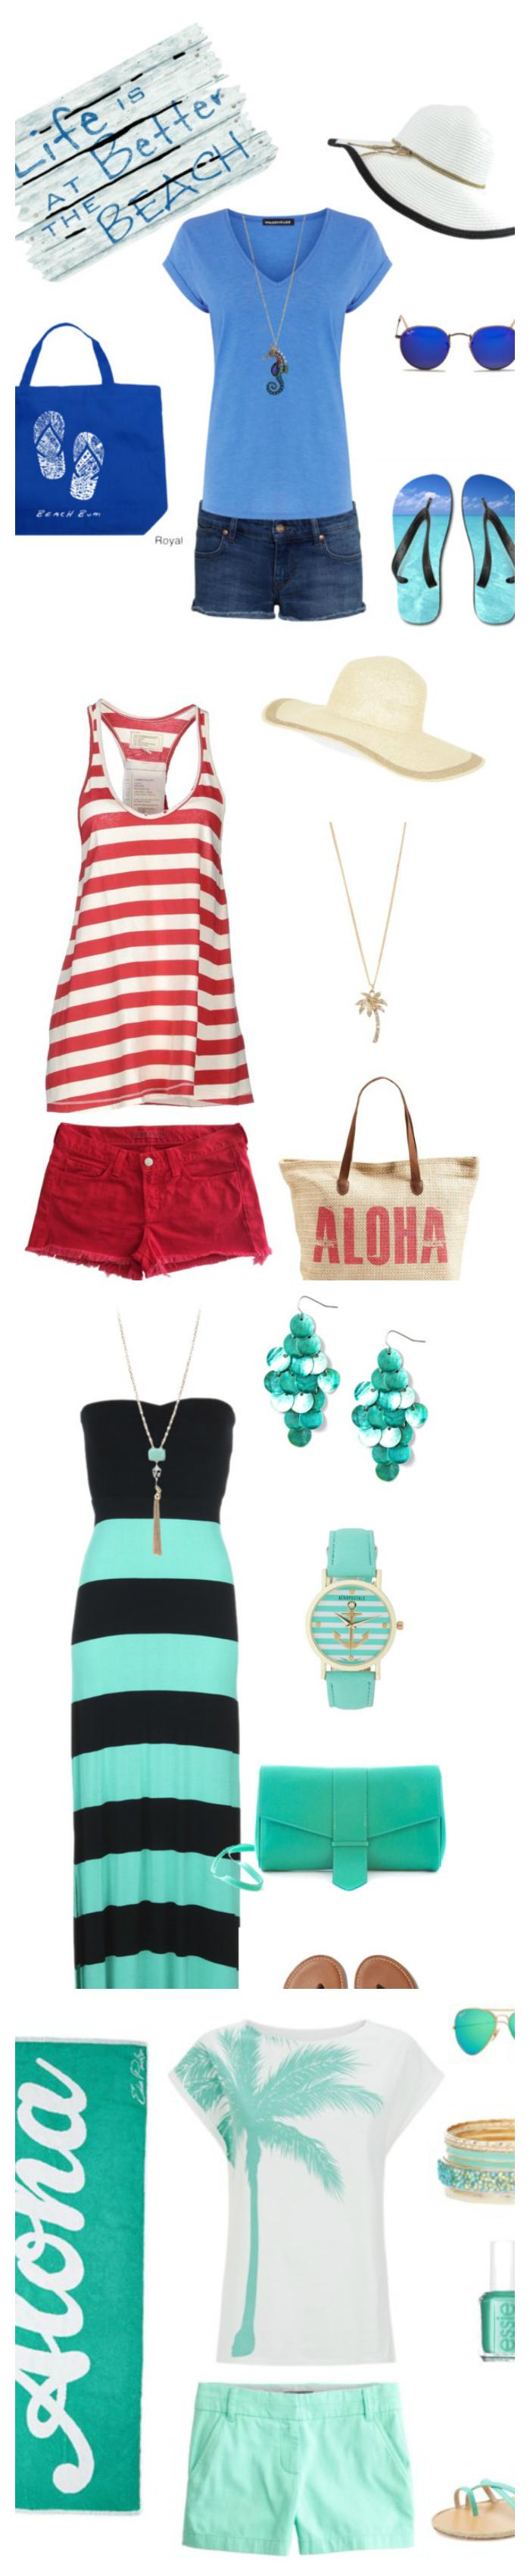 My Favorite Beach Styles